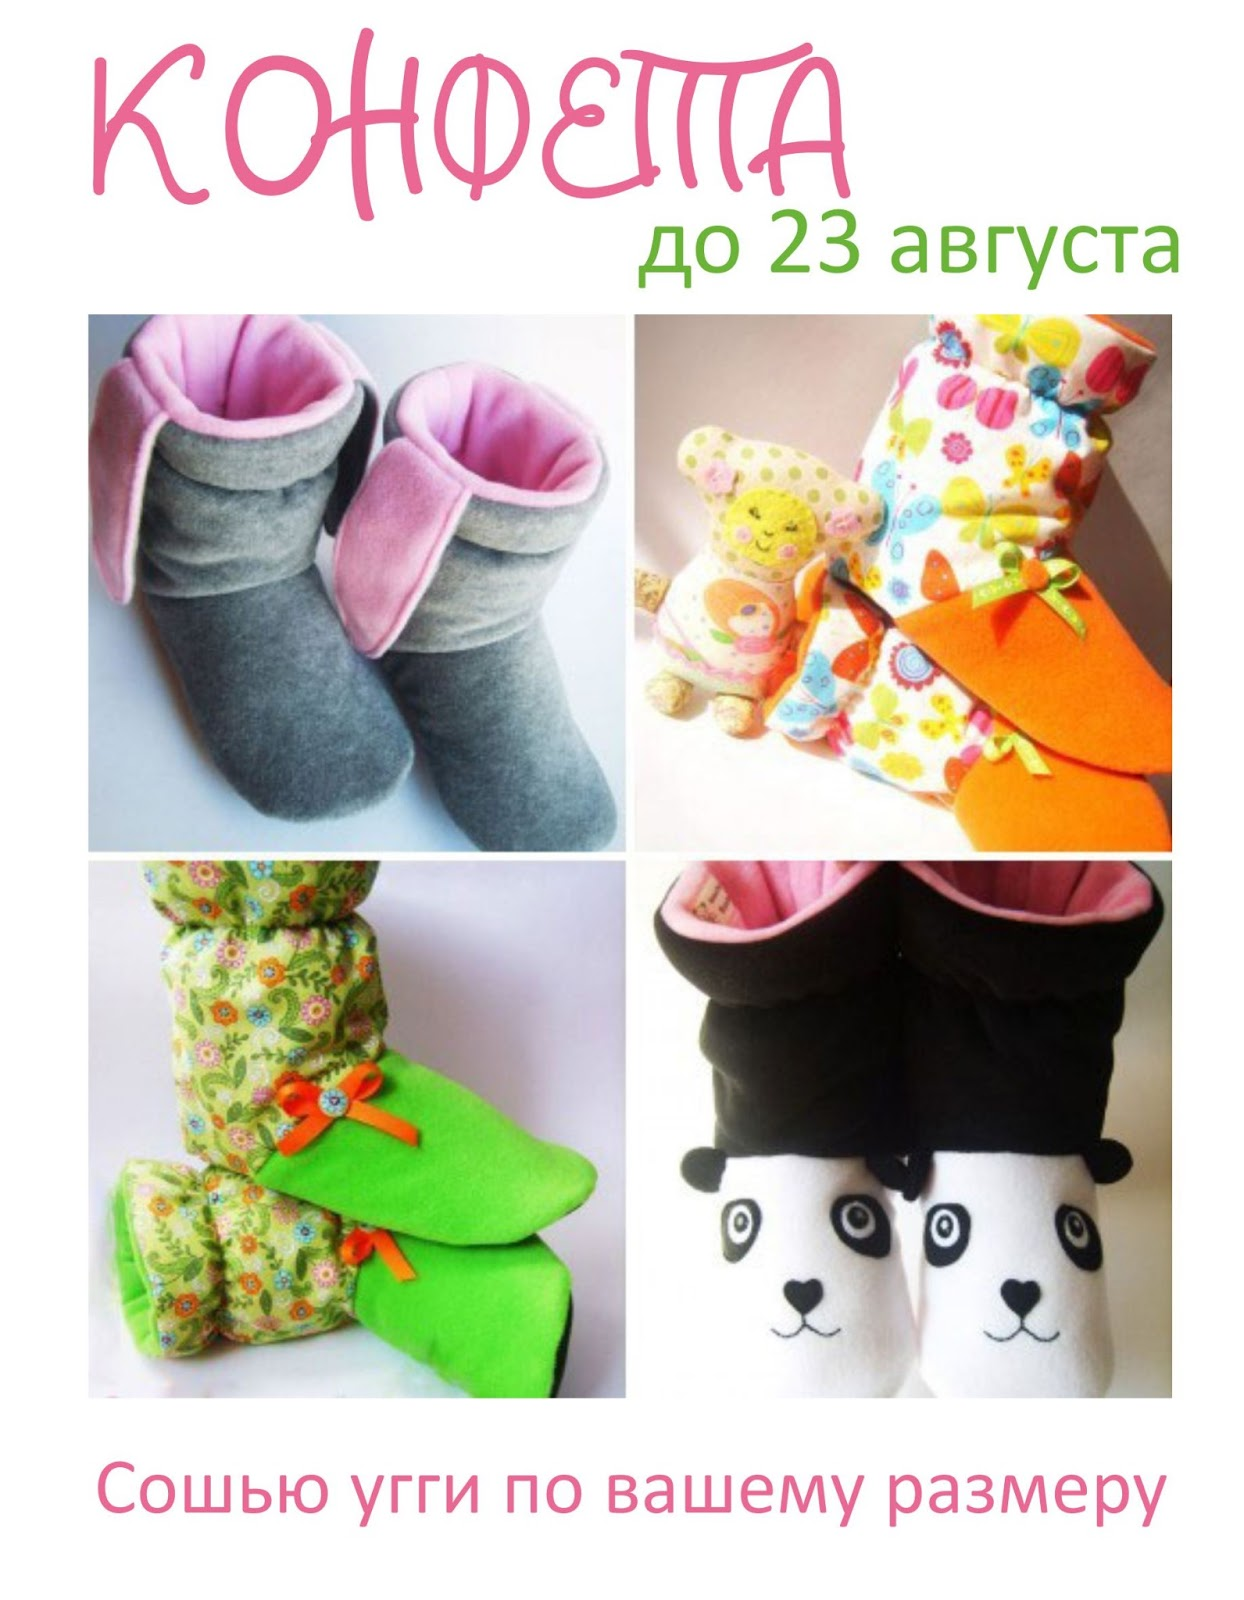 23 Августа Ирина